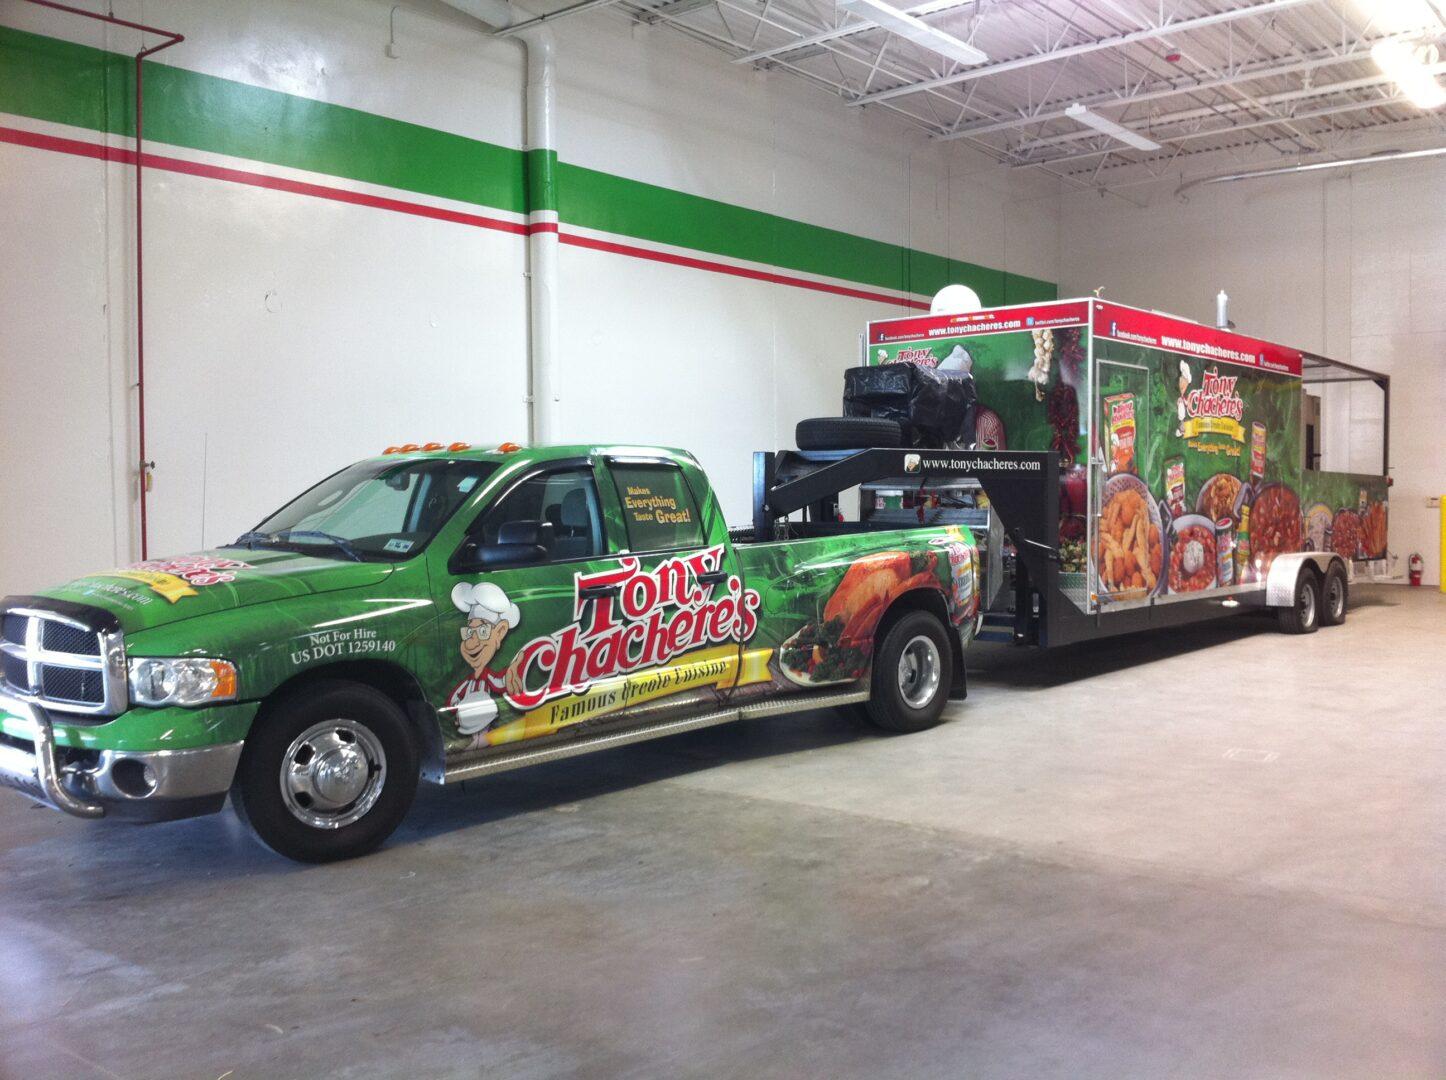 Fleet Graphics Slidell, LA Vehicle Wraps SEI HQ Tony Chacheres